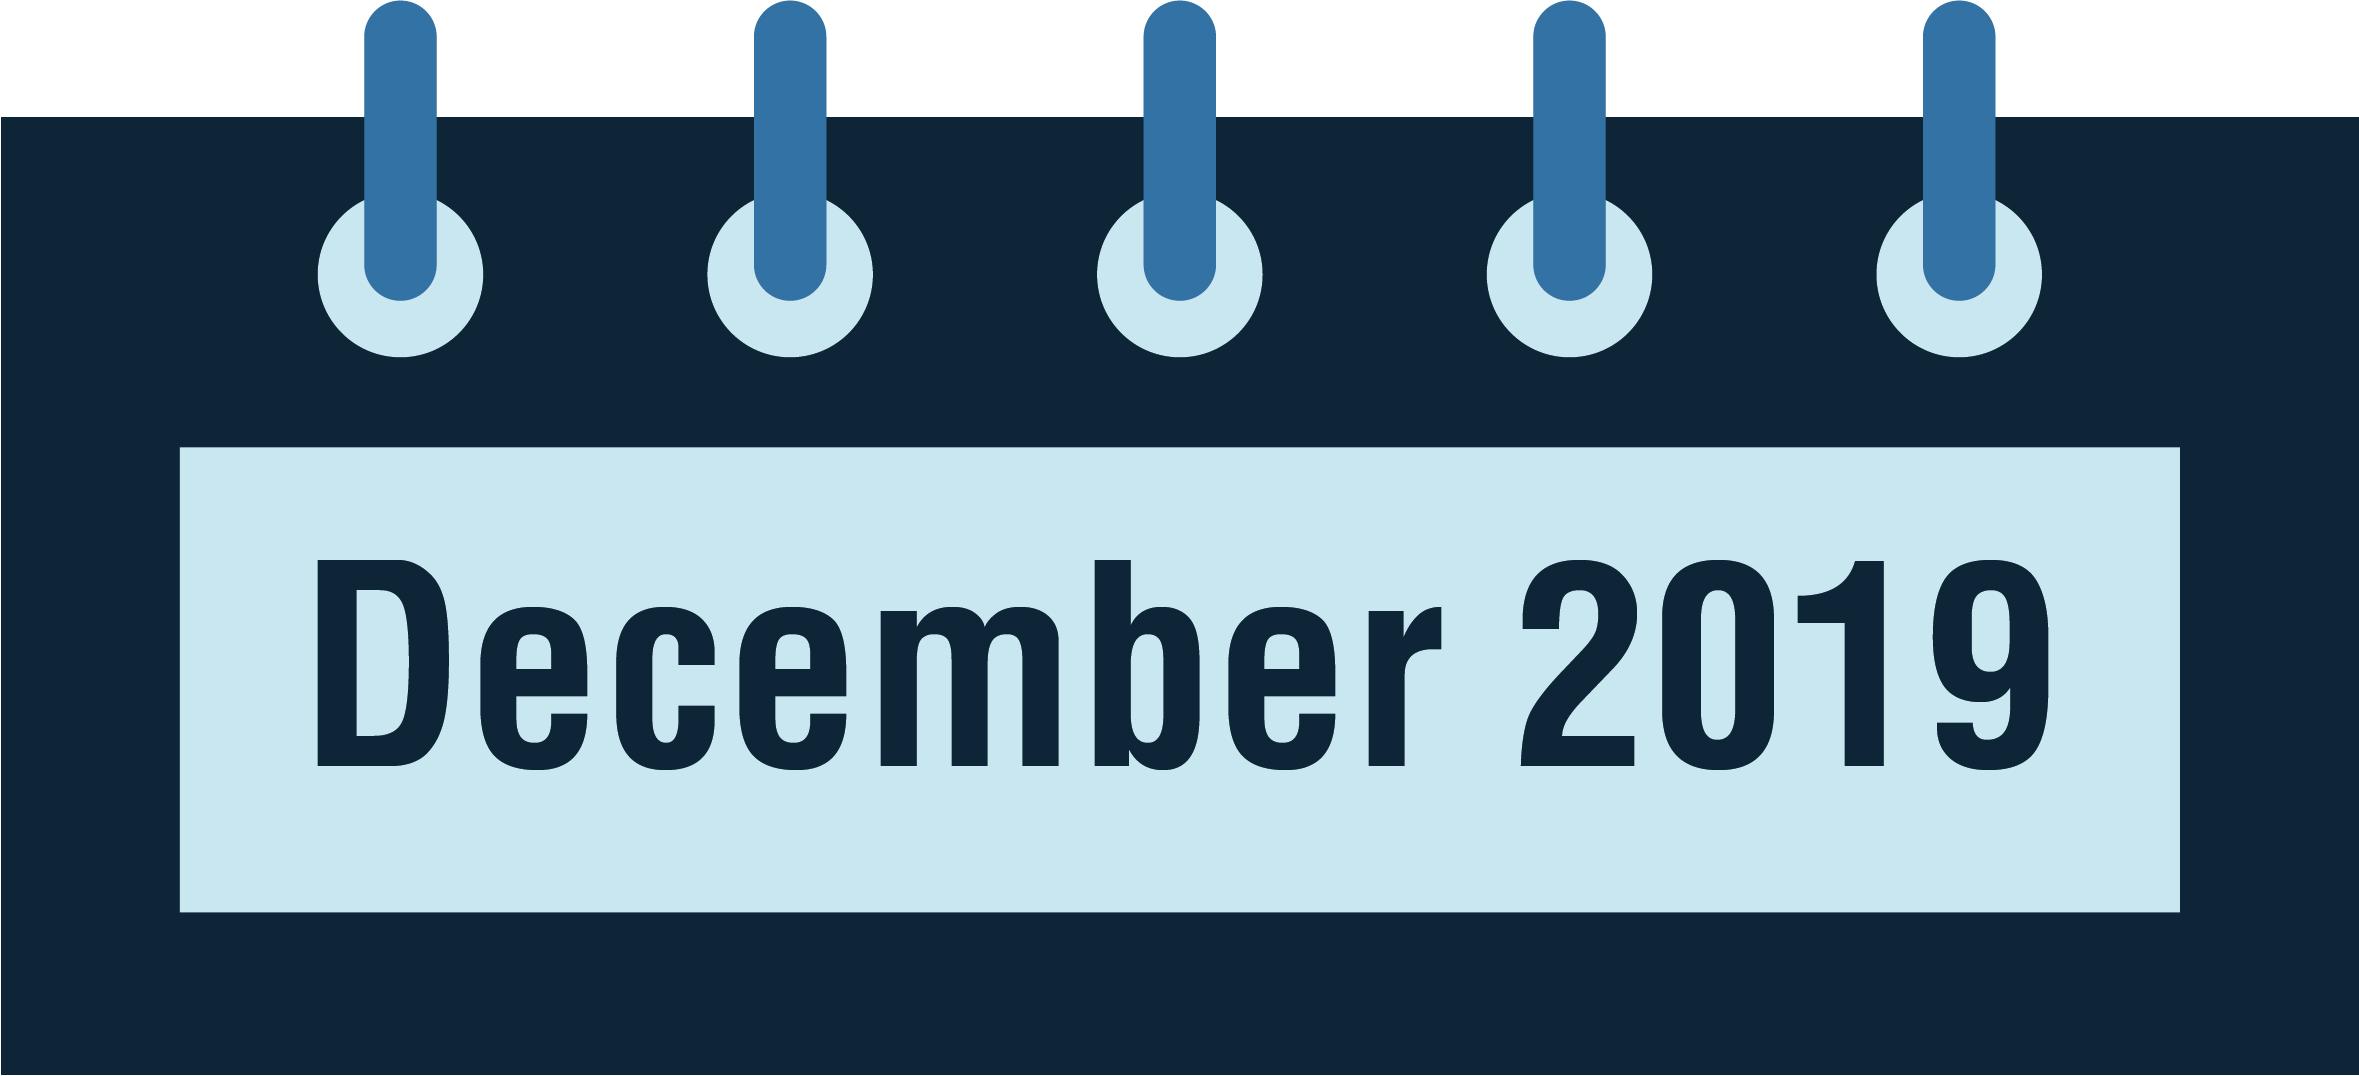 NeuroCheck History - December 2019 (Image © NeuroCheck)